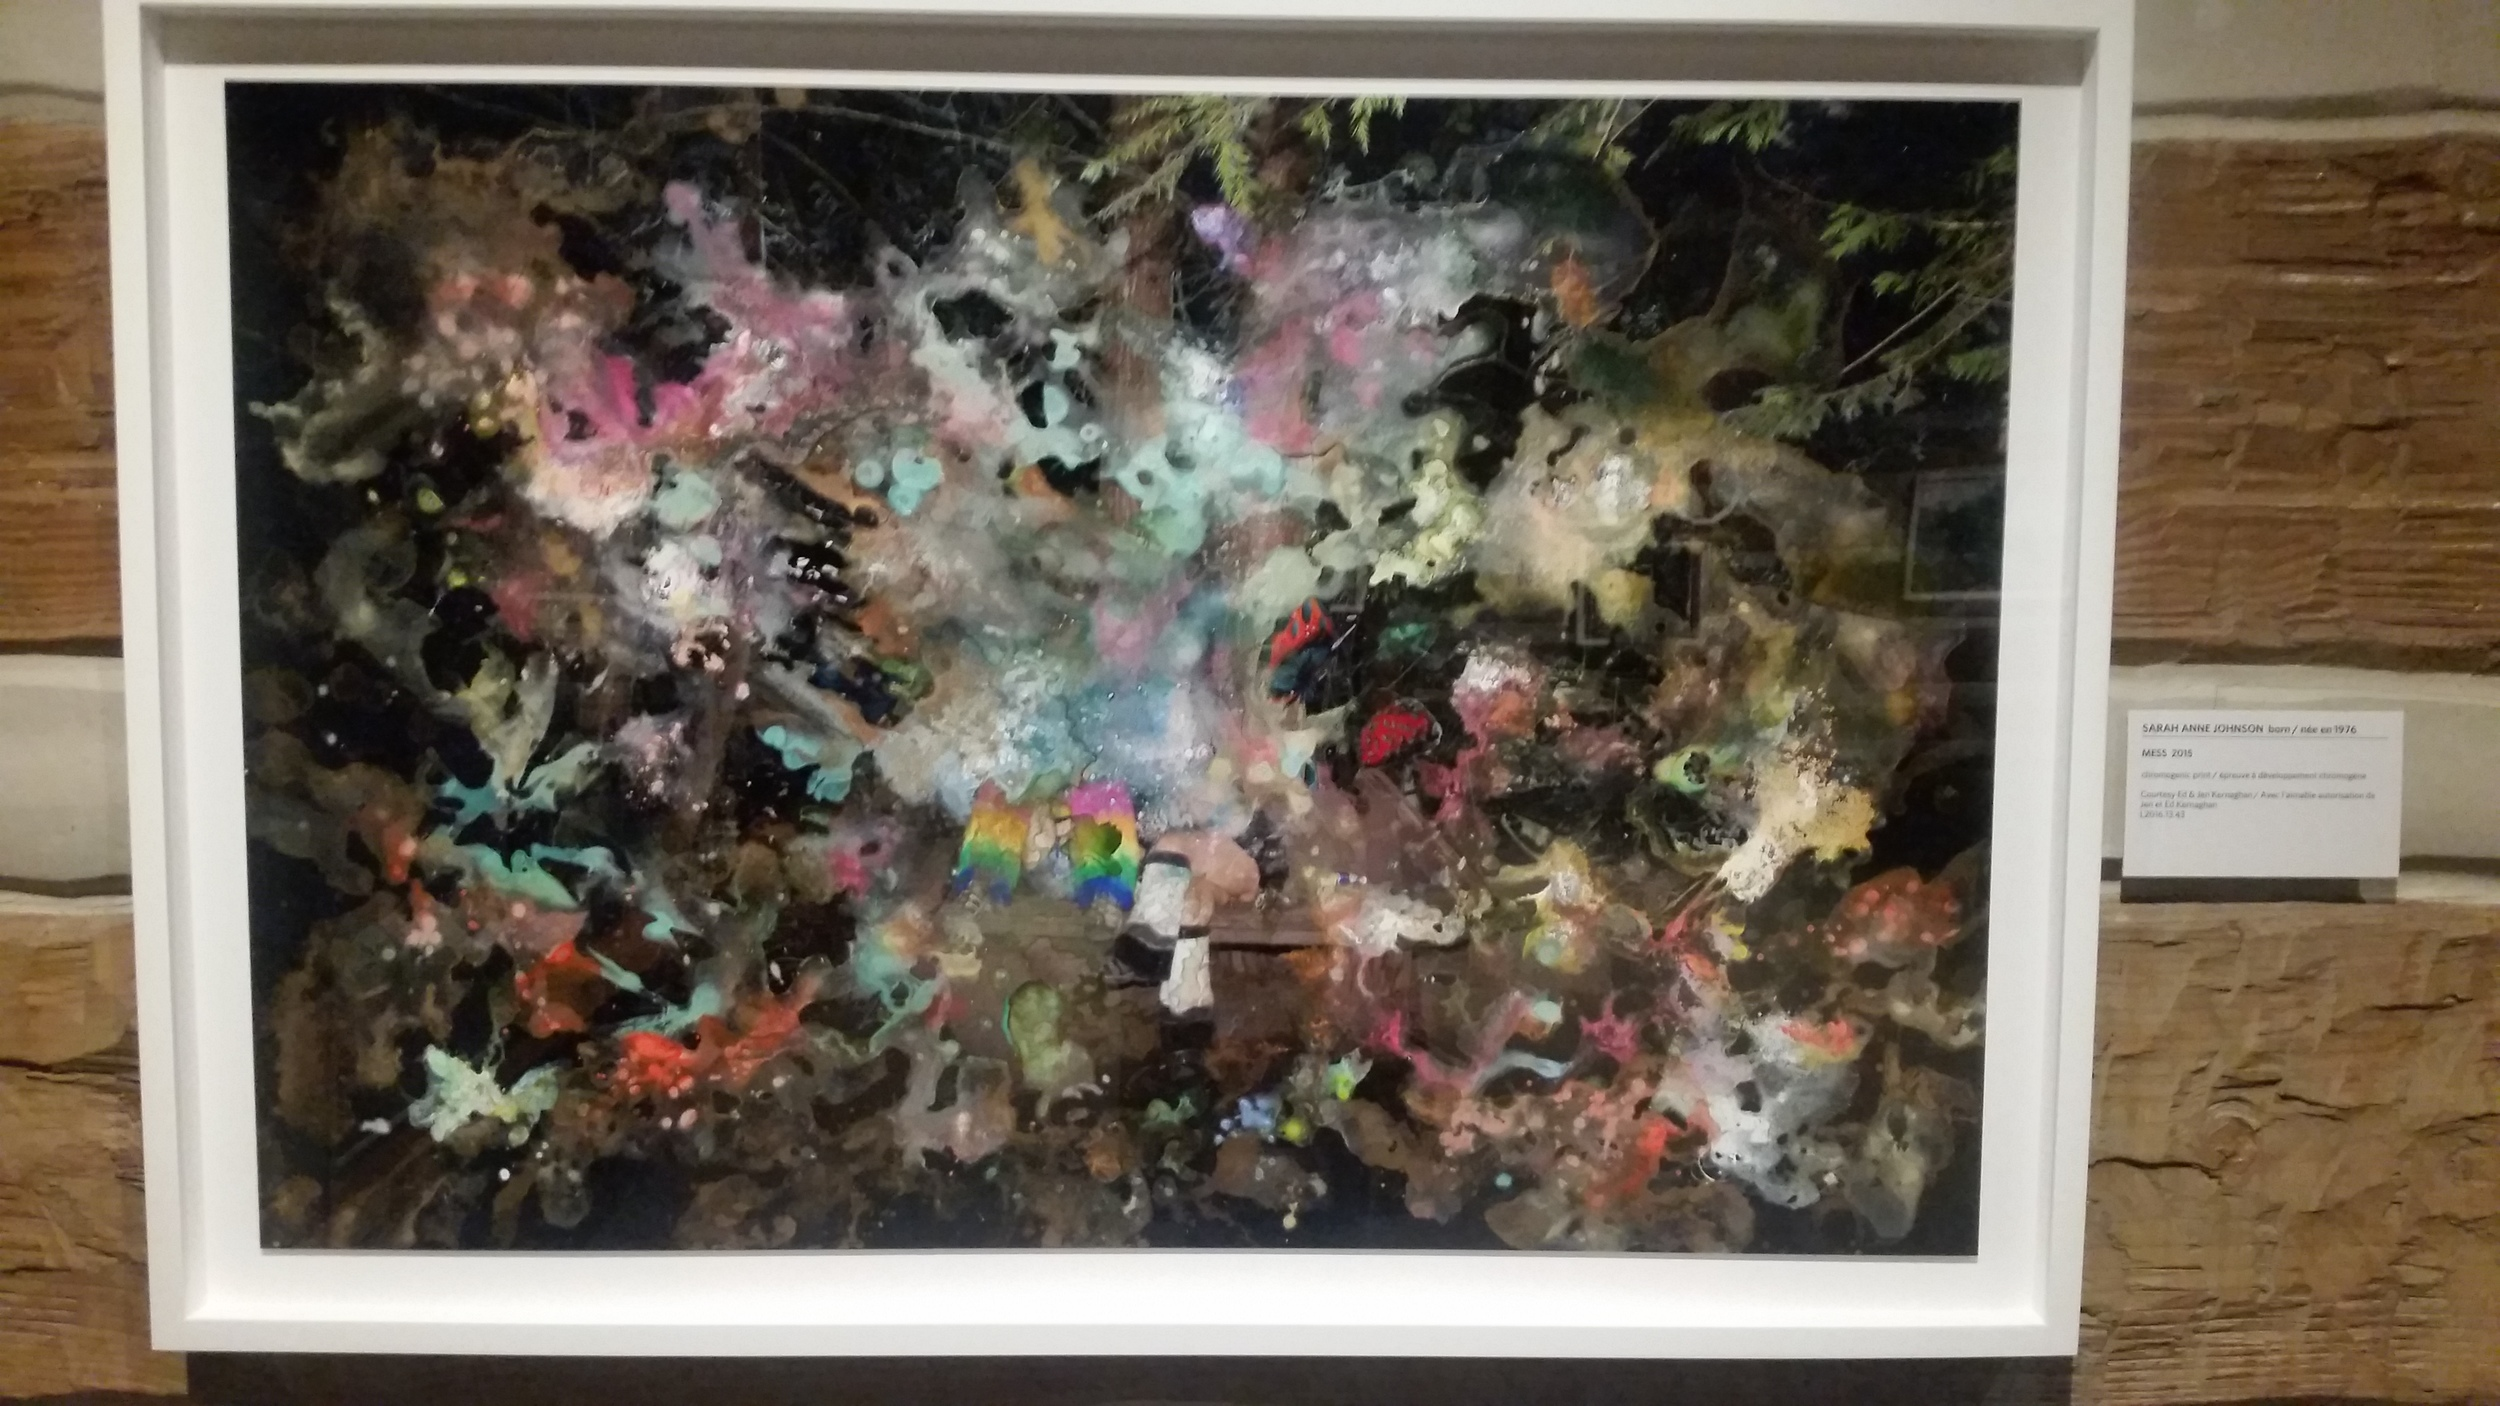 Mess by Sarah Anne Johnson. Chromogenic print.